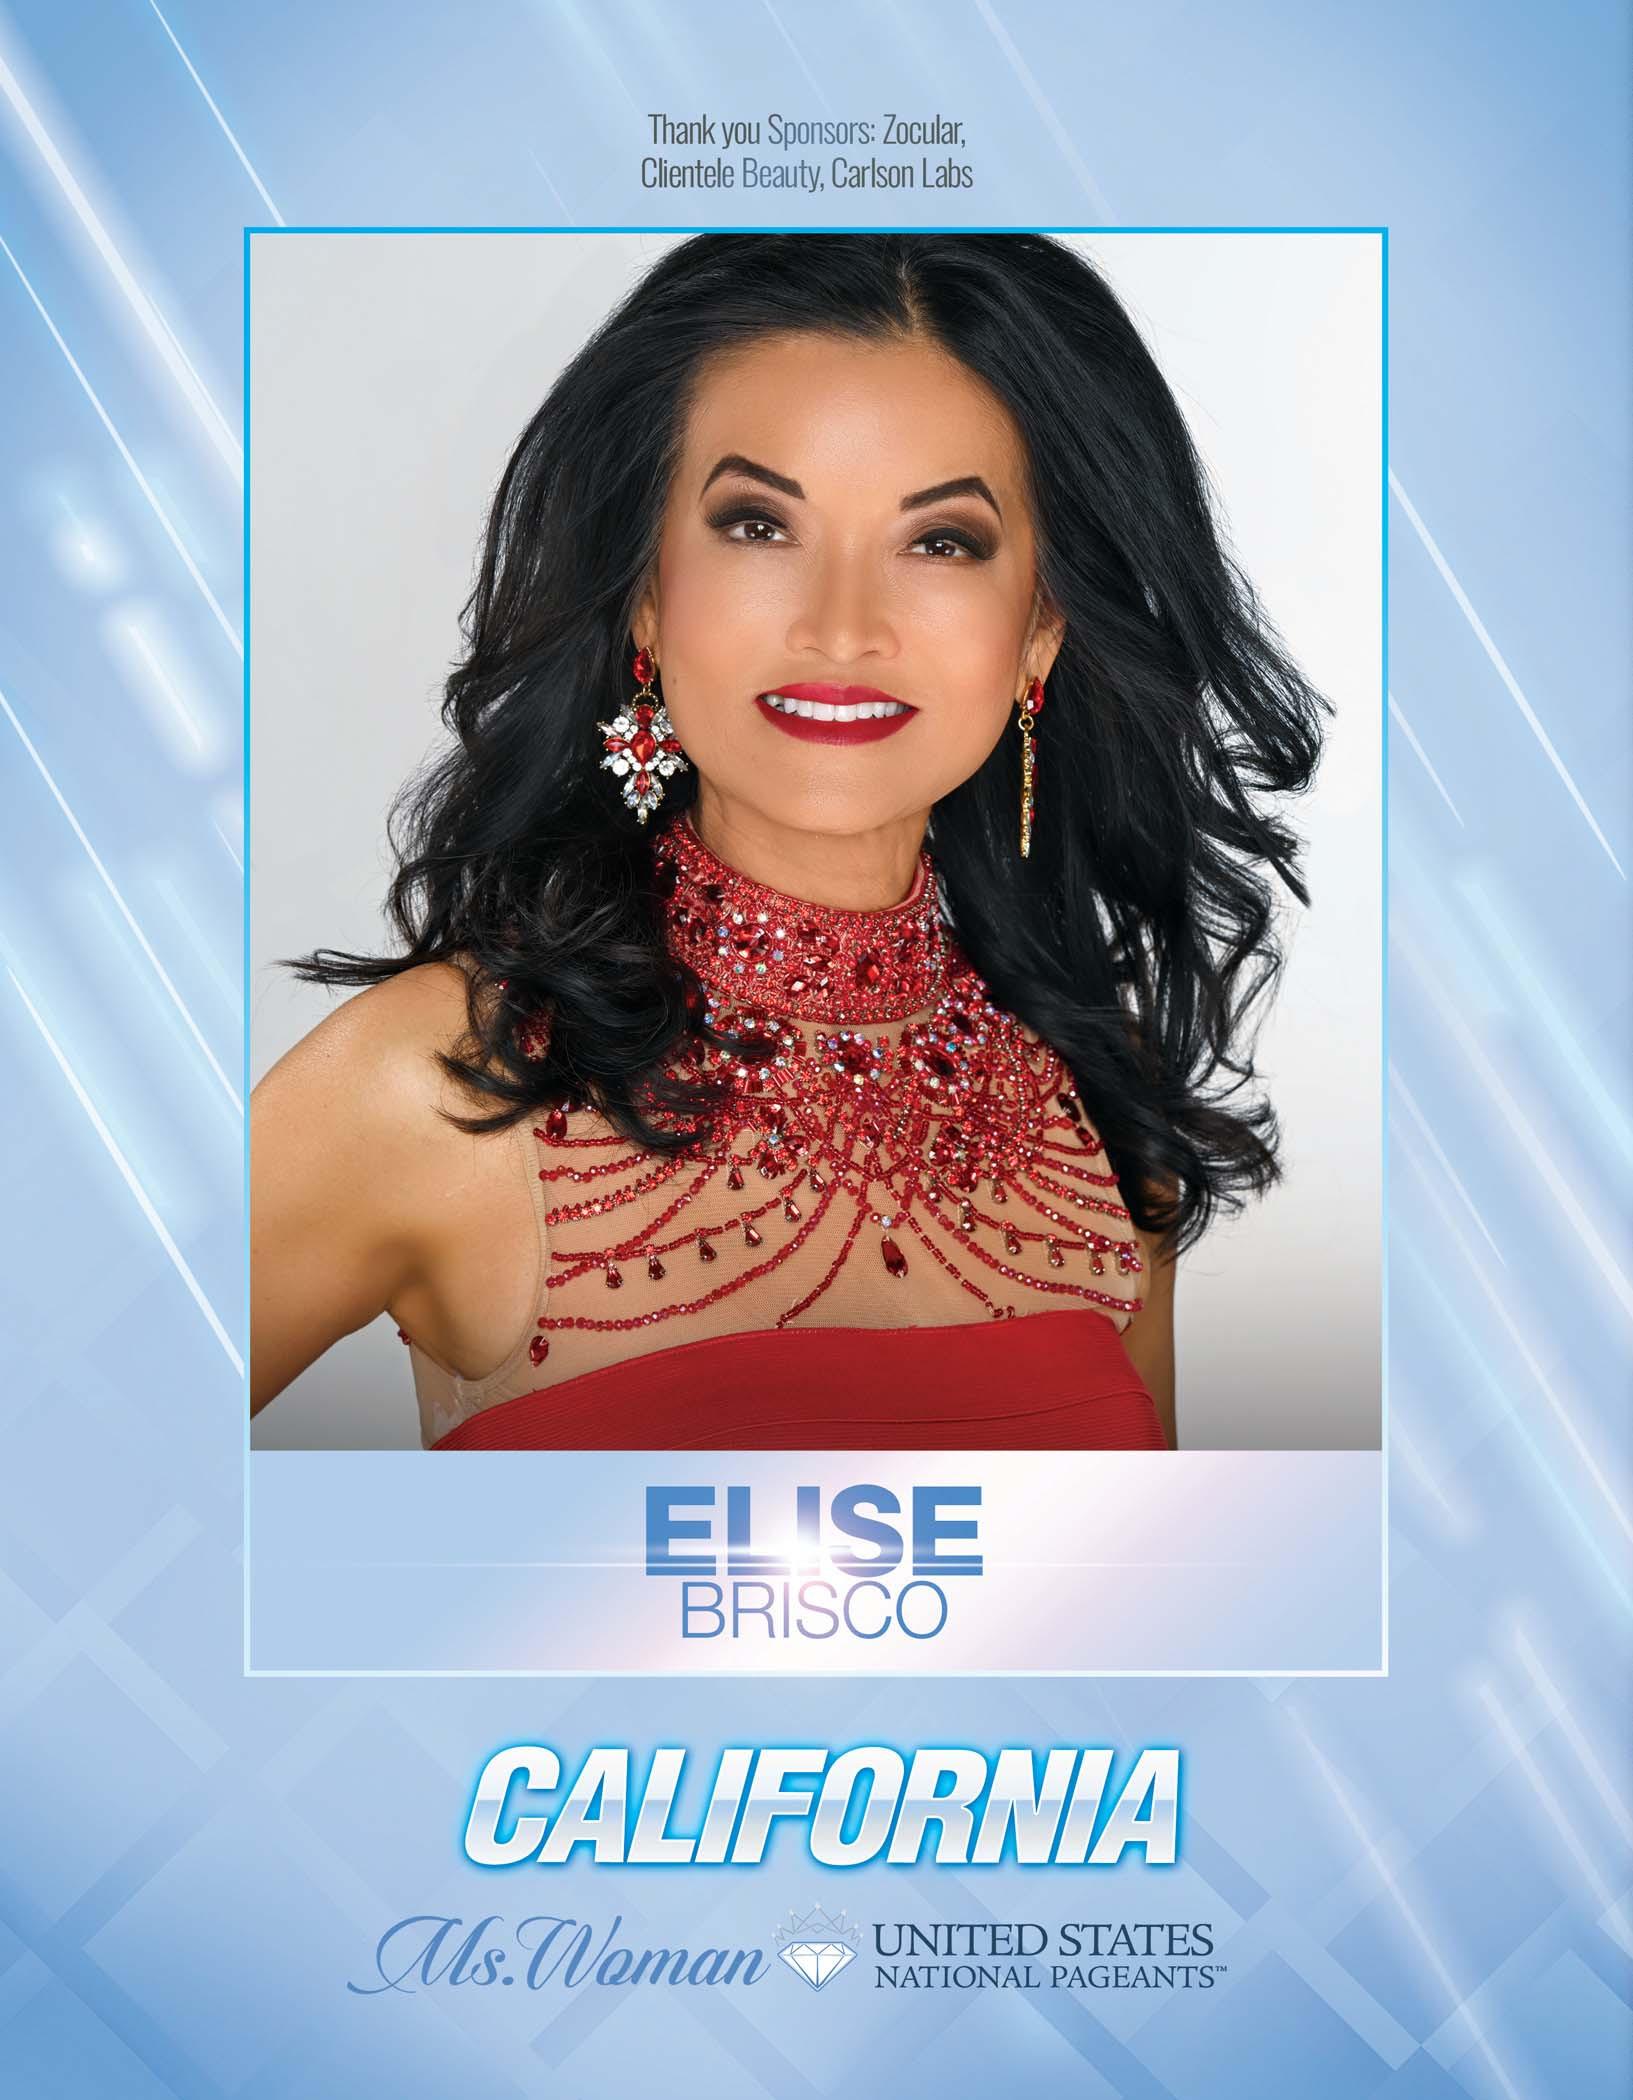 Elise Brisco Ms. Woman California United States - 2021